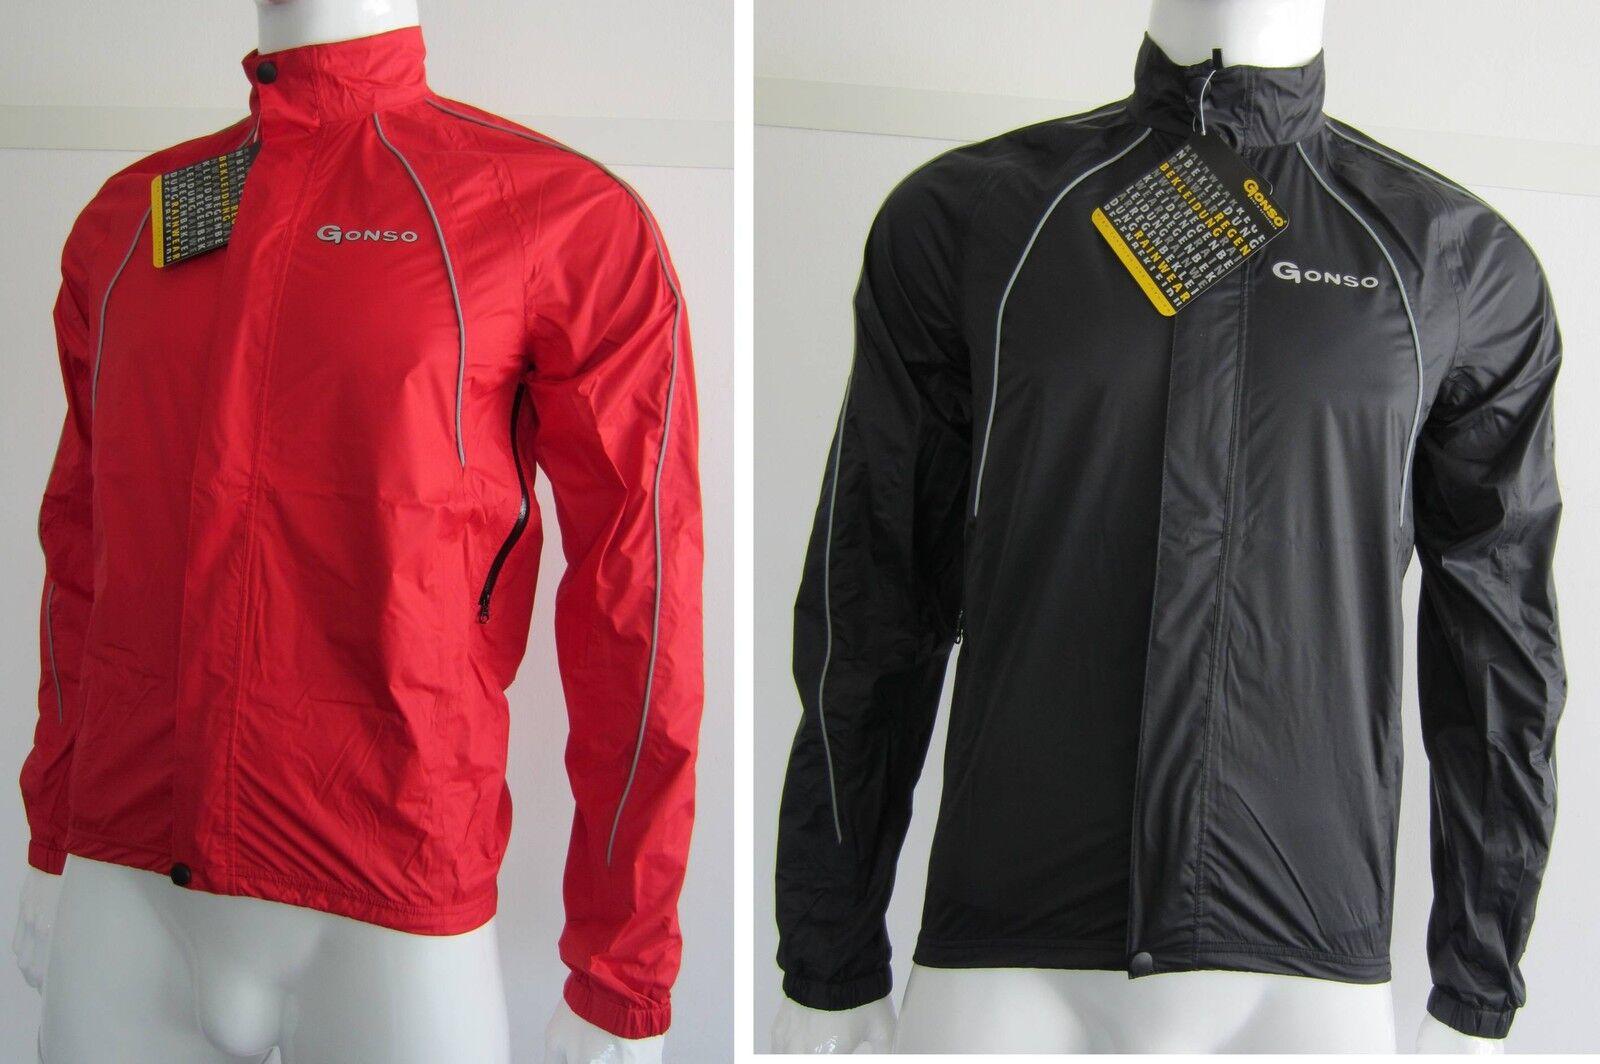 "Caballeros Caballeros Caballeros Gonso lluvia chaqueta ""splash"" bikejacke negro o. rojo nuevo 32150 alpencross  Venta al por mayor barato y de alta calidad."